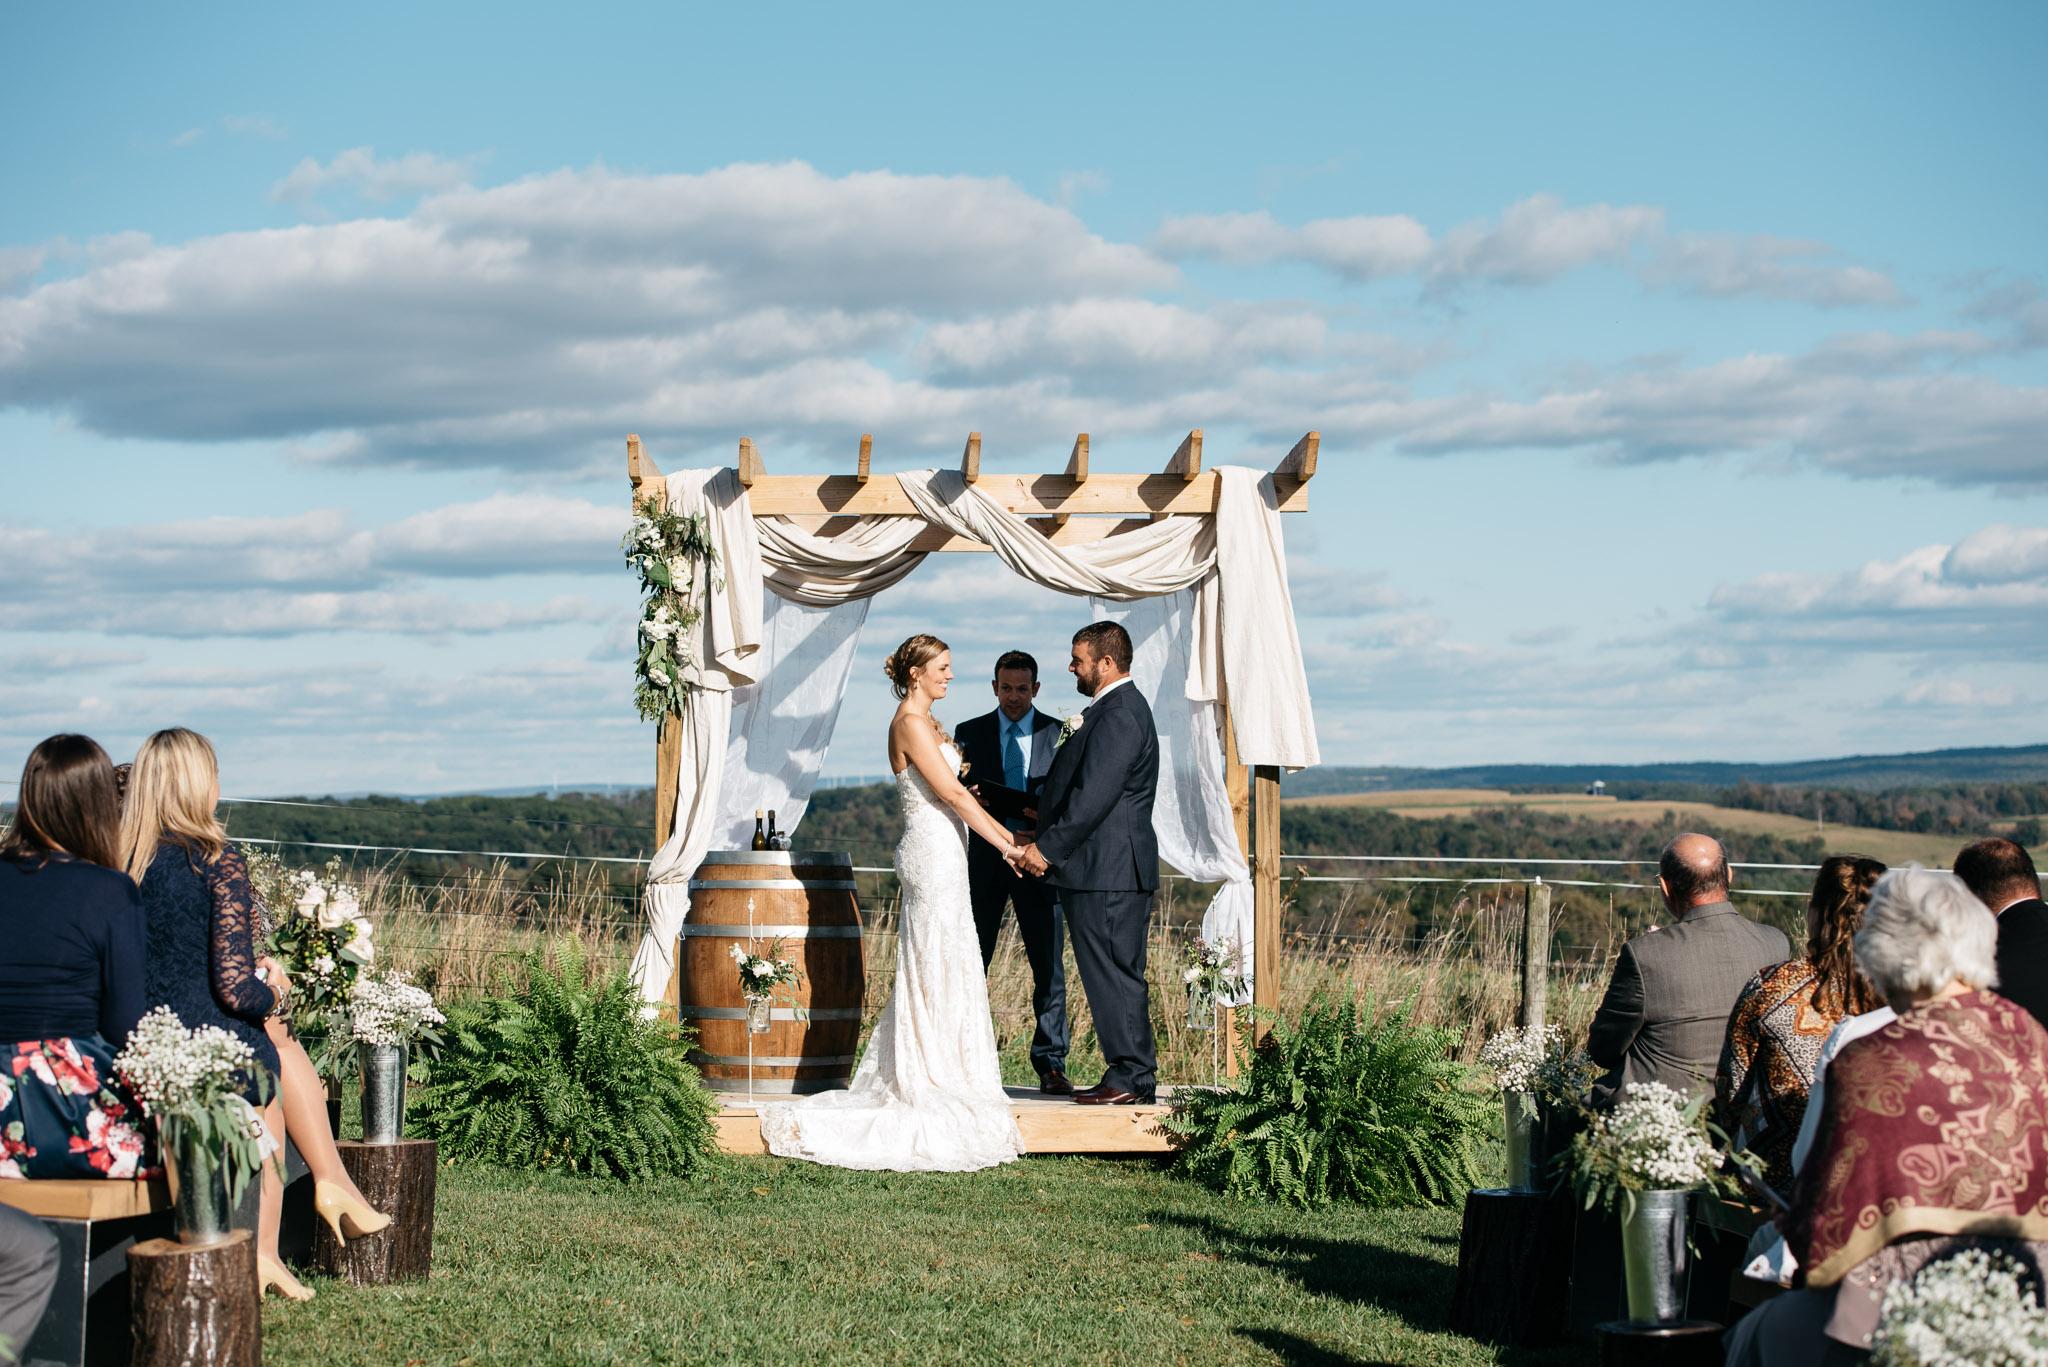 pittsburgh-ligonier-wedding-photographer-the-event-barn-at-highland-farms-17-2.jpg